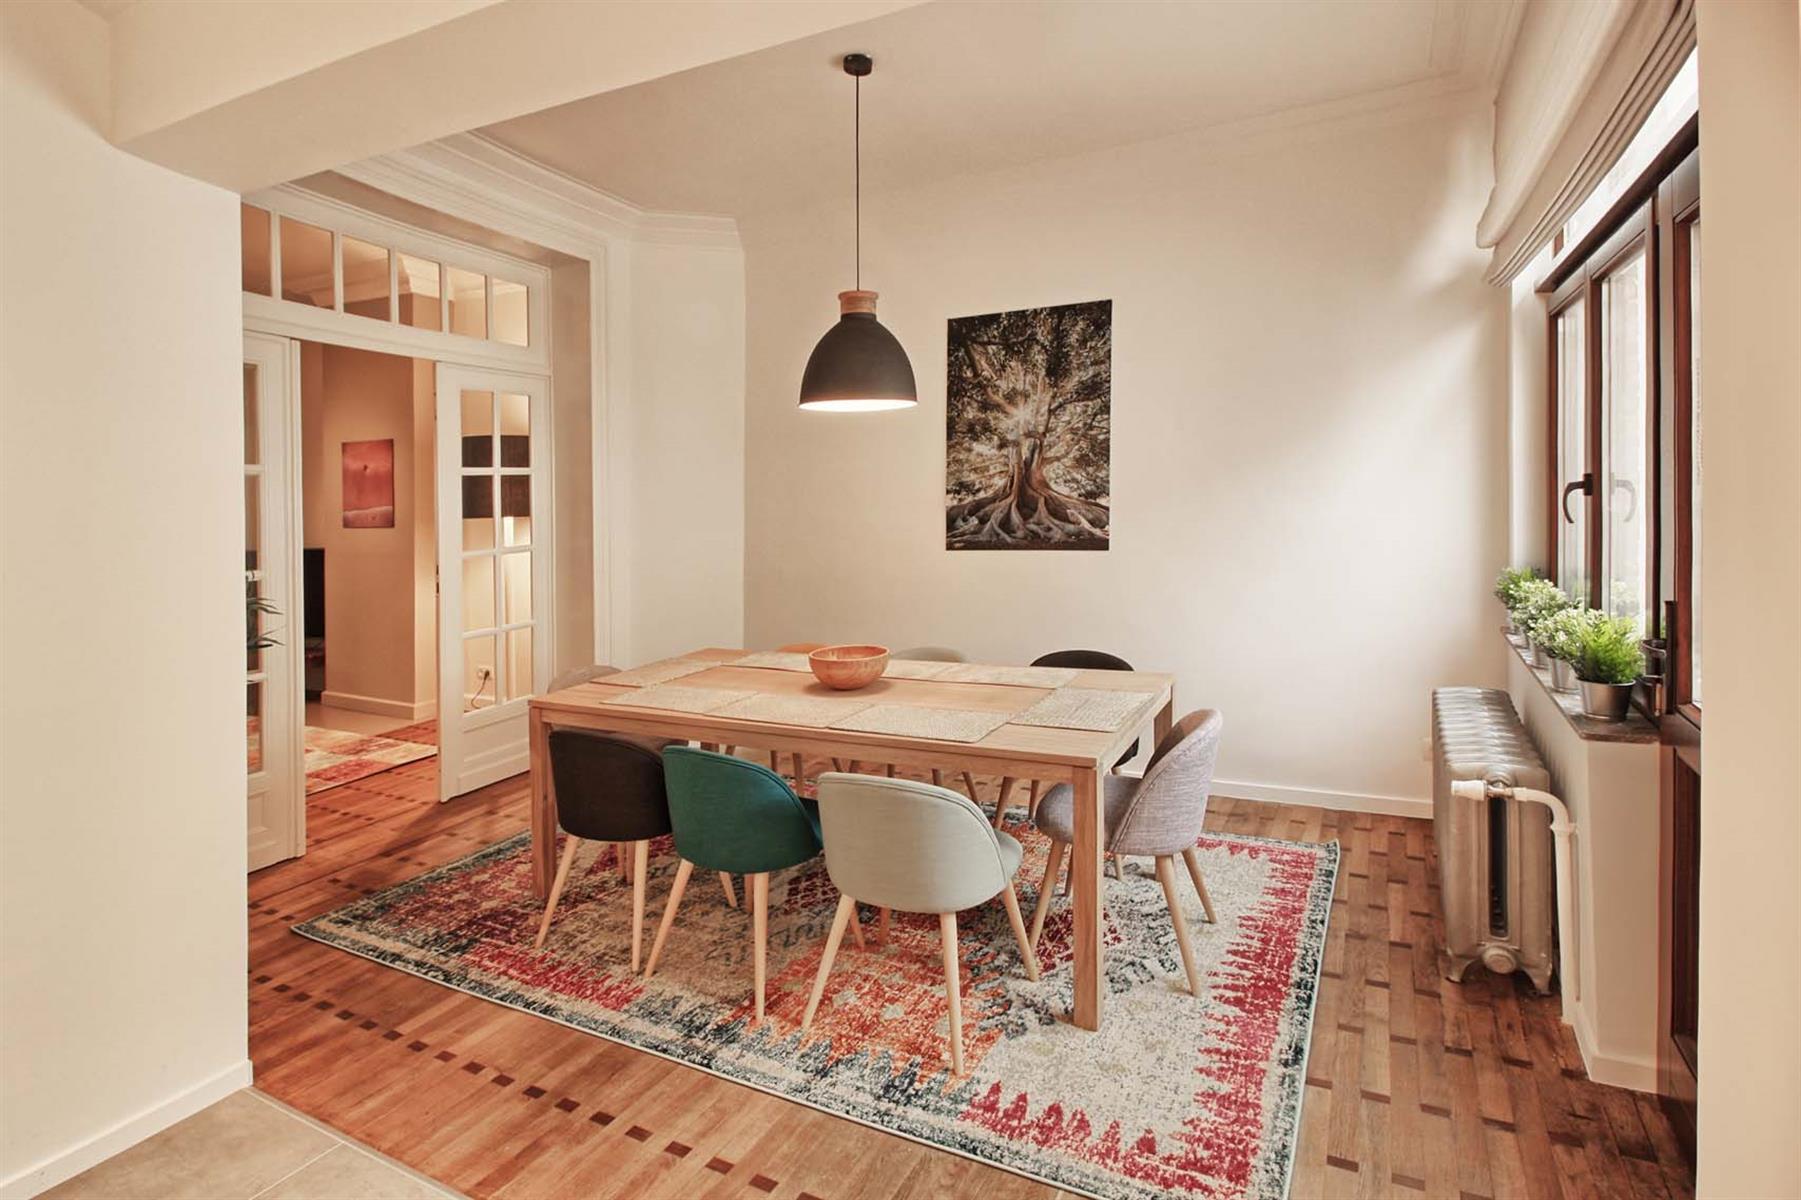 Maison - Ixelles - #4106764-3